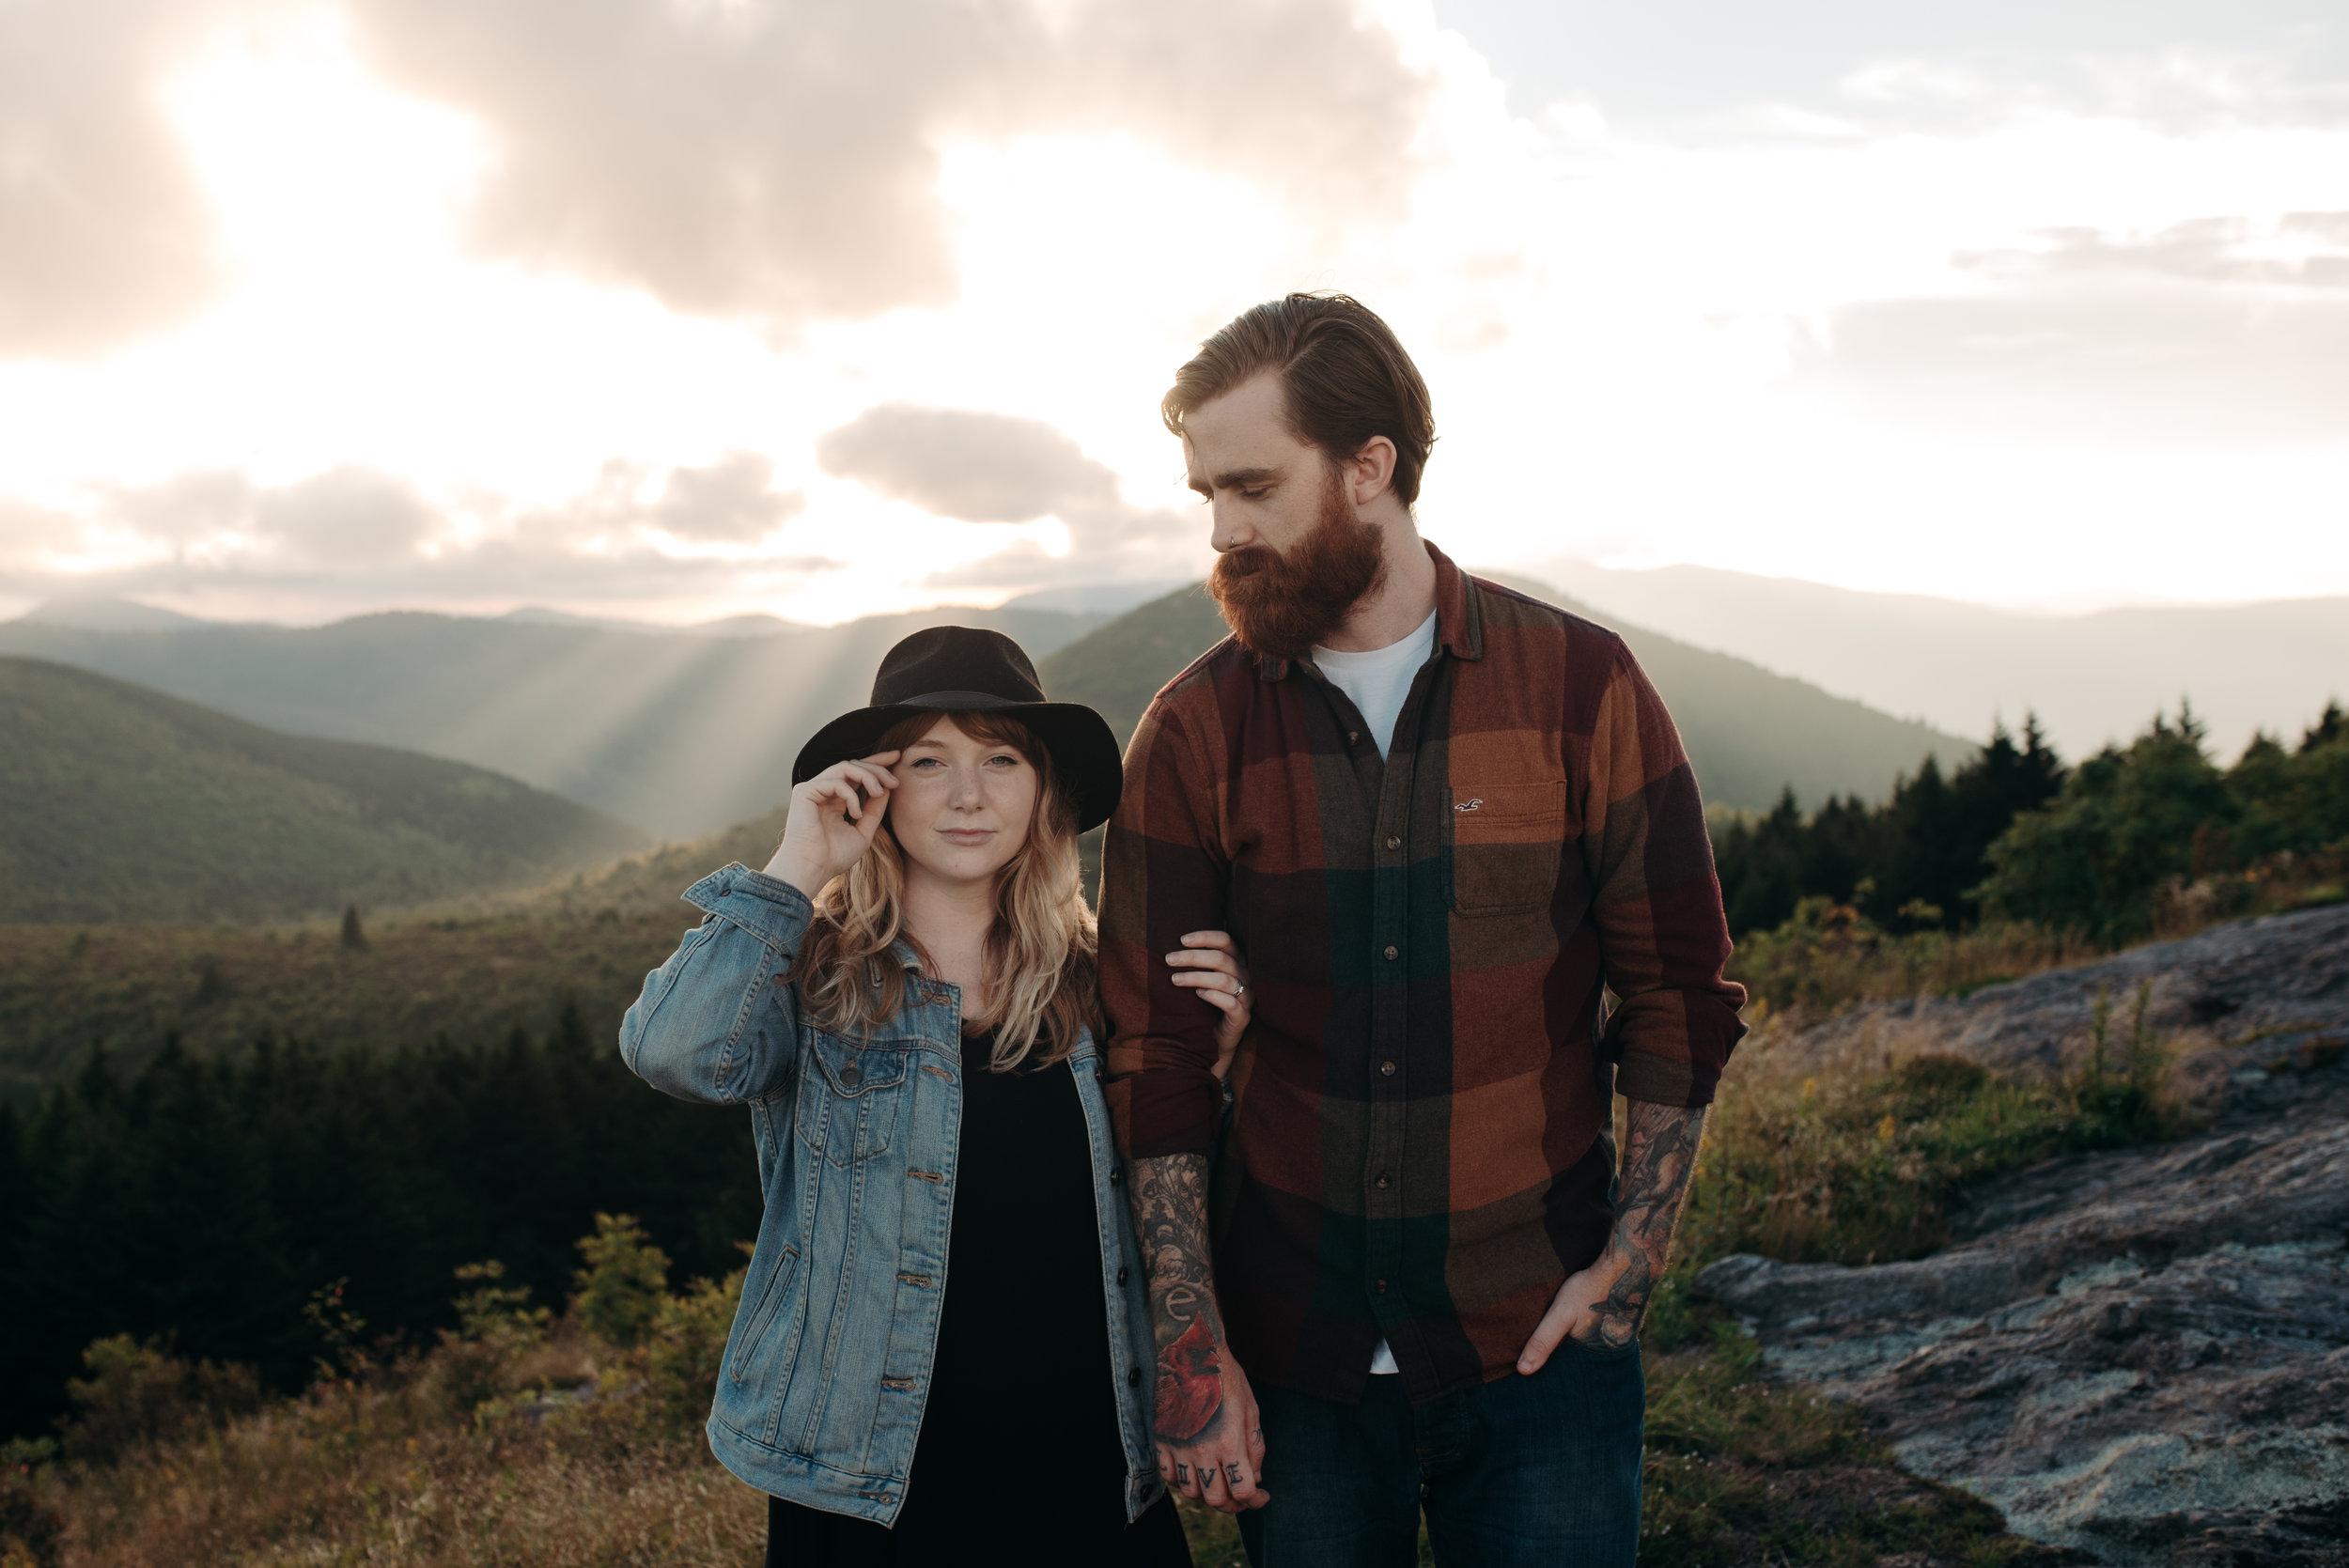 leah-joe-middleton-asheville-north-carolina-couple-session-destination-elopement-photographer-fox-and-film-99.jpg